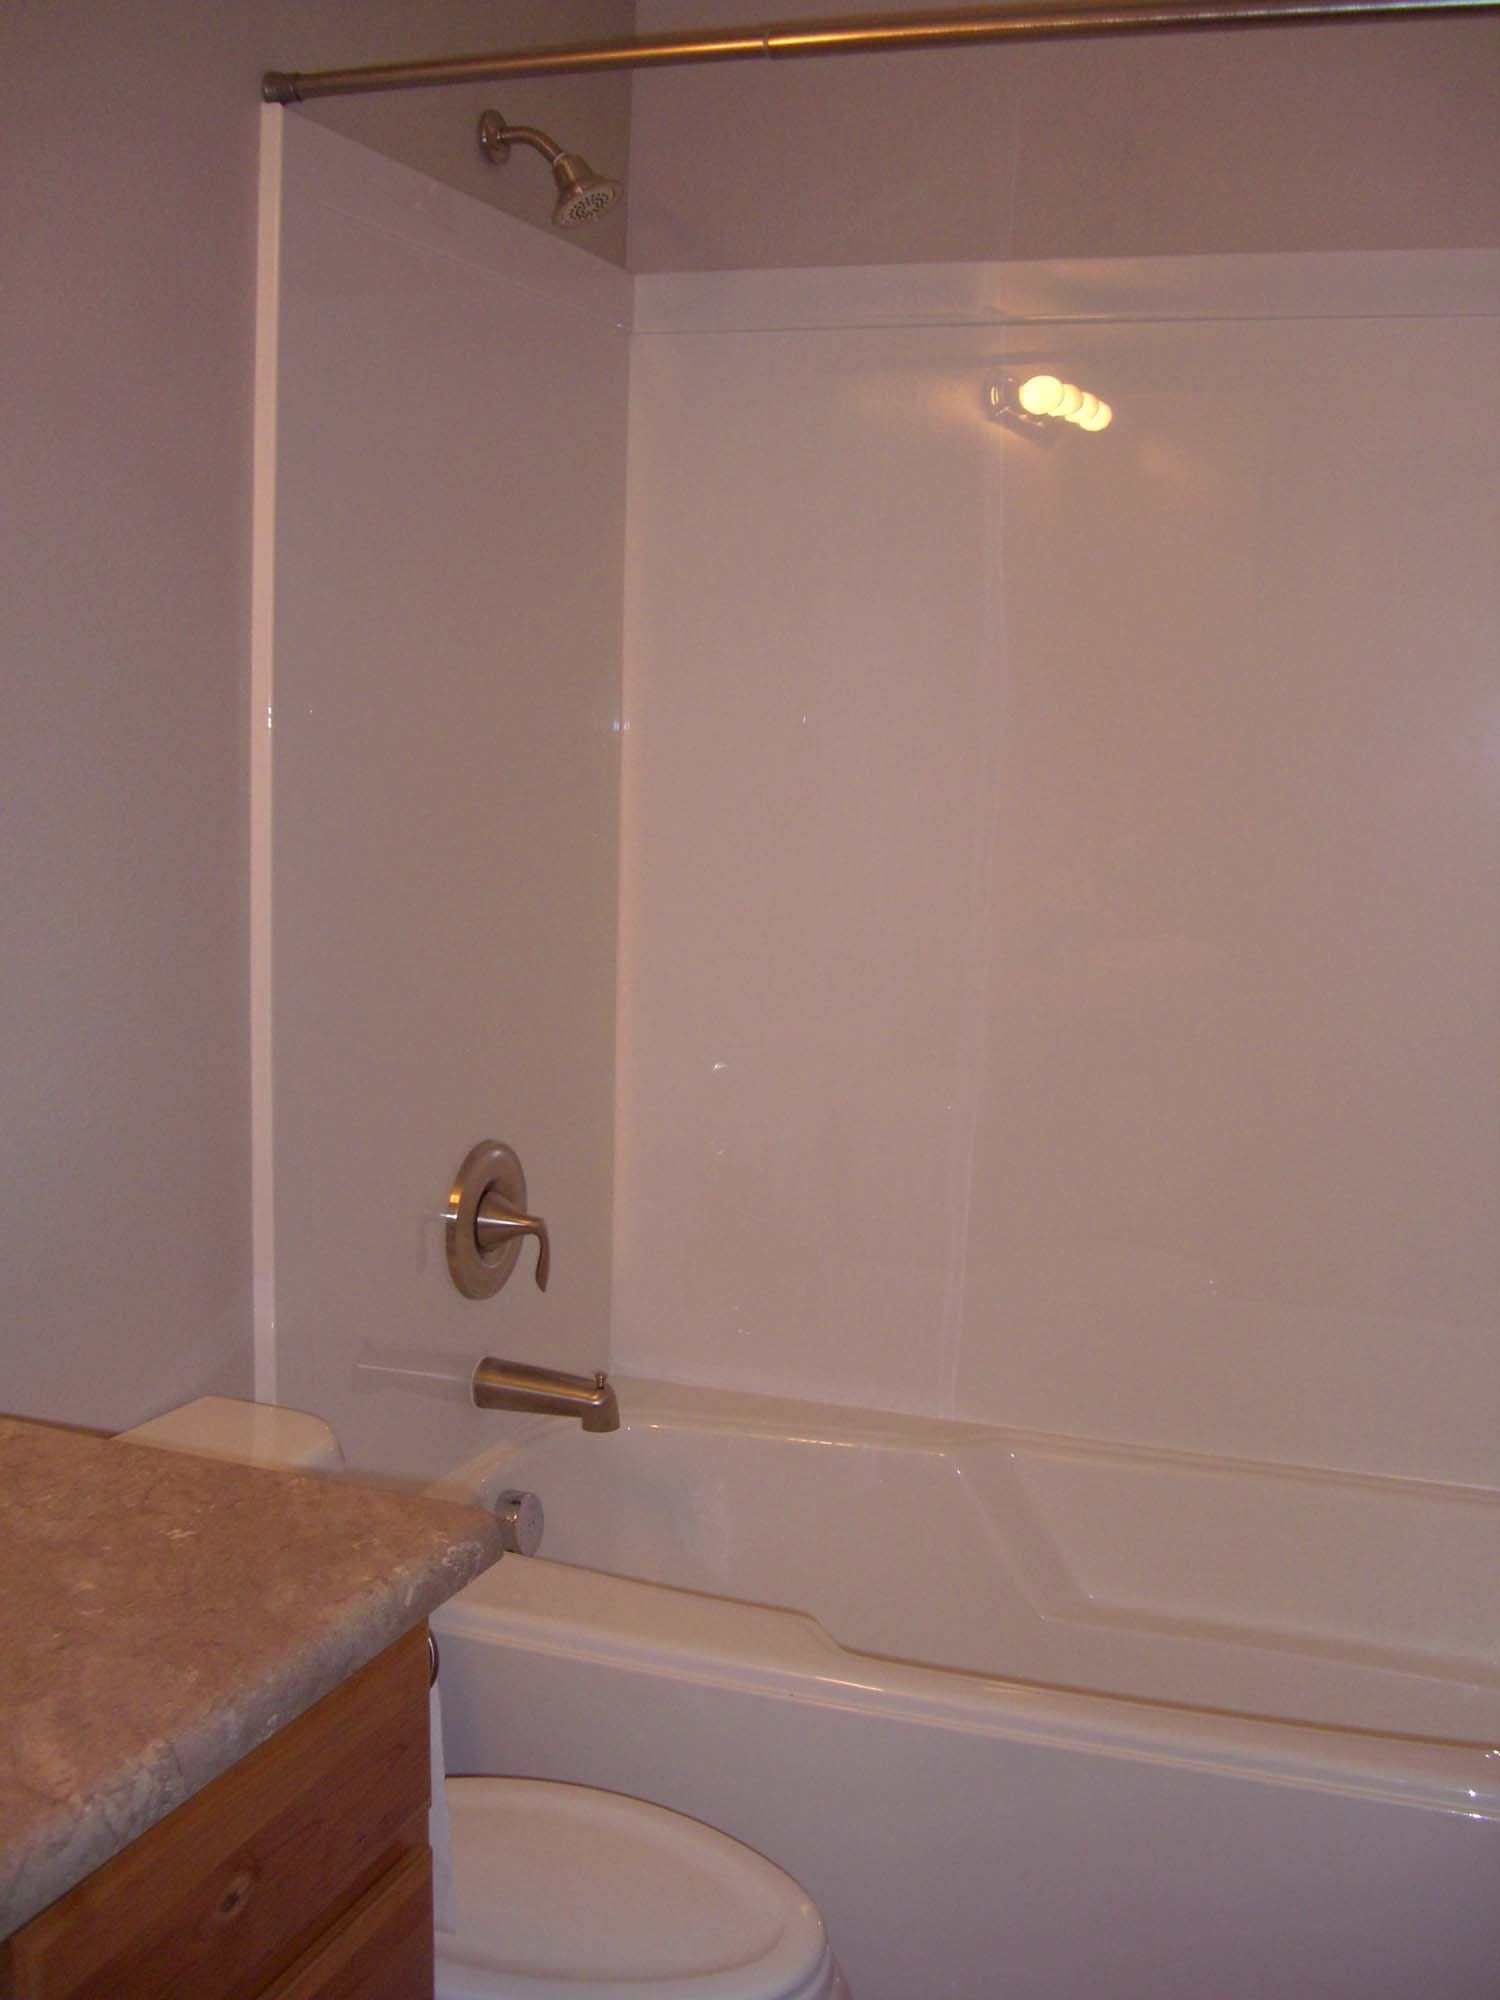 Bathtub Enclosure Materials - Tubethevote